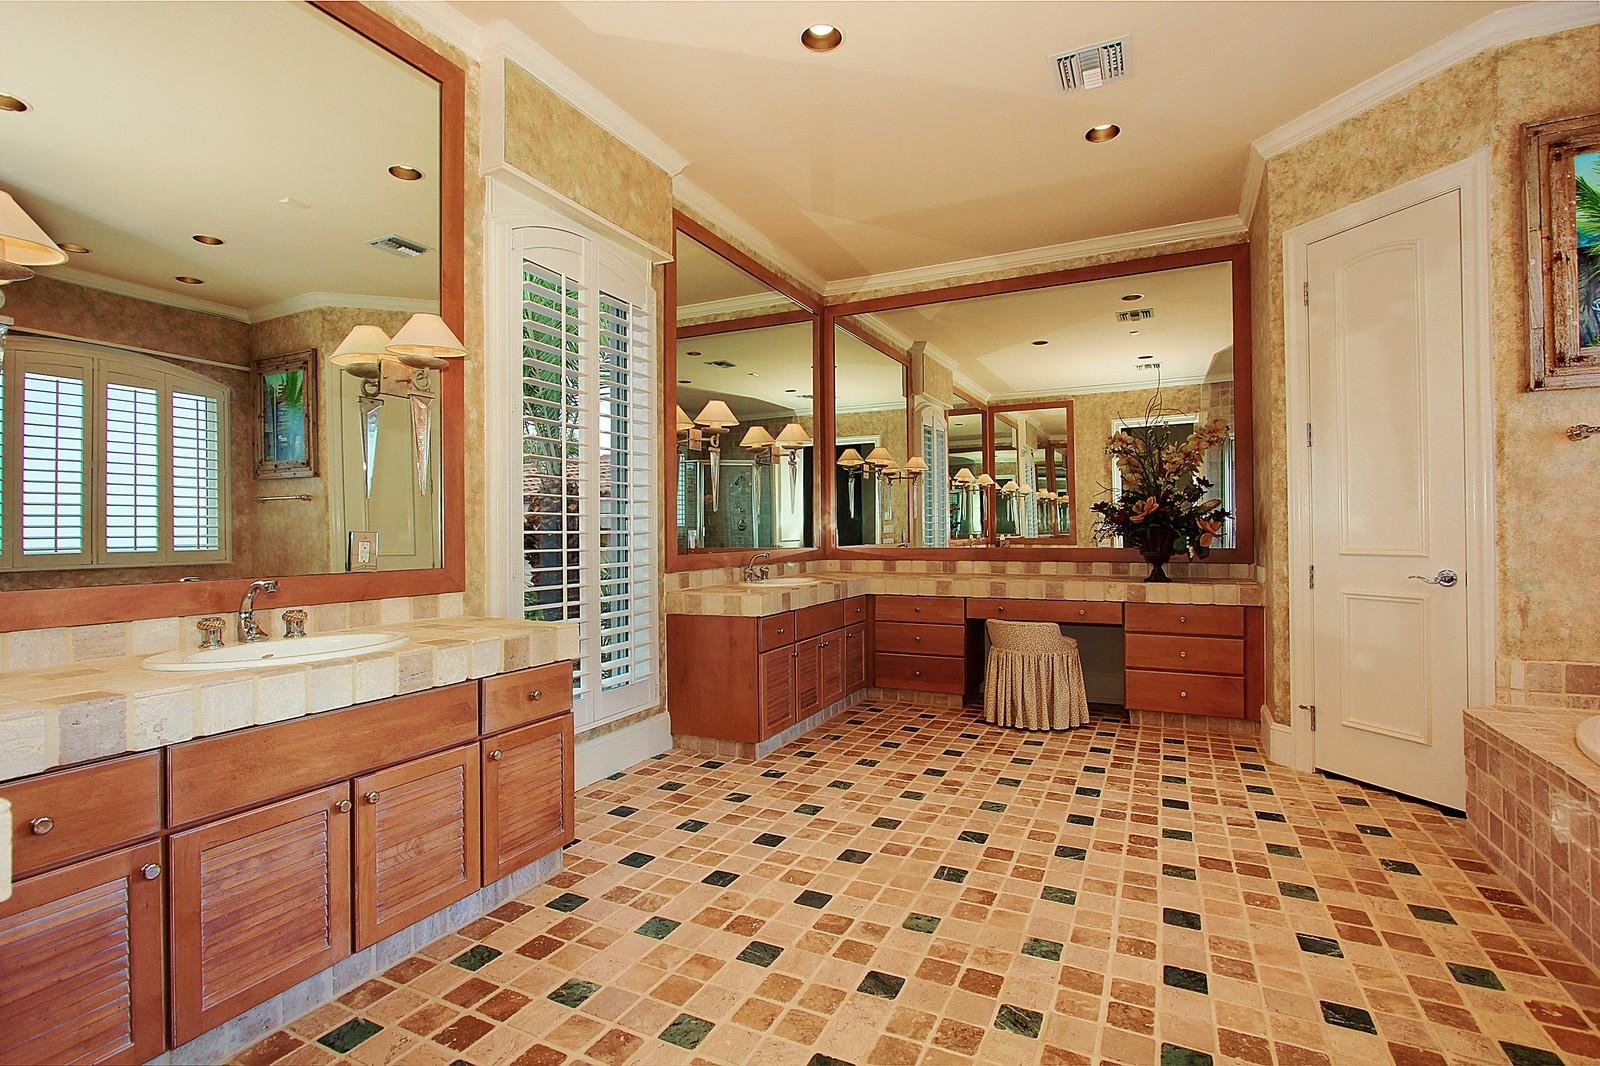 Real Estate Photography - 3047 SE Island Point Lane, Stuart, FL, 34996 - Guest House Bathroom 1 of 4 full baths